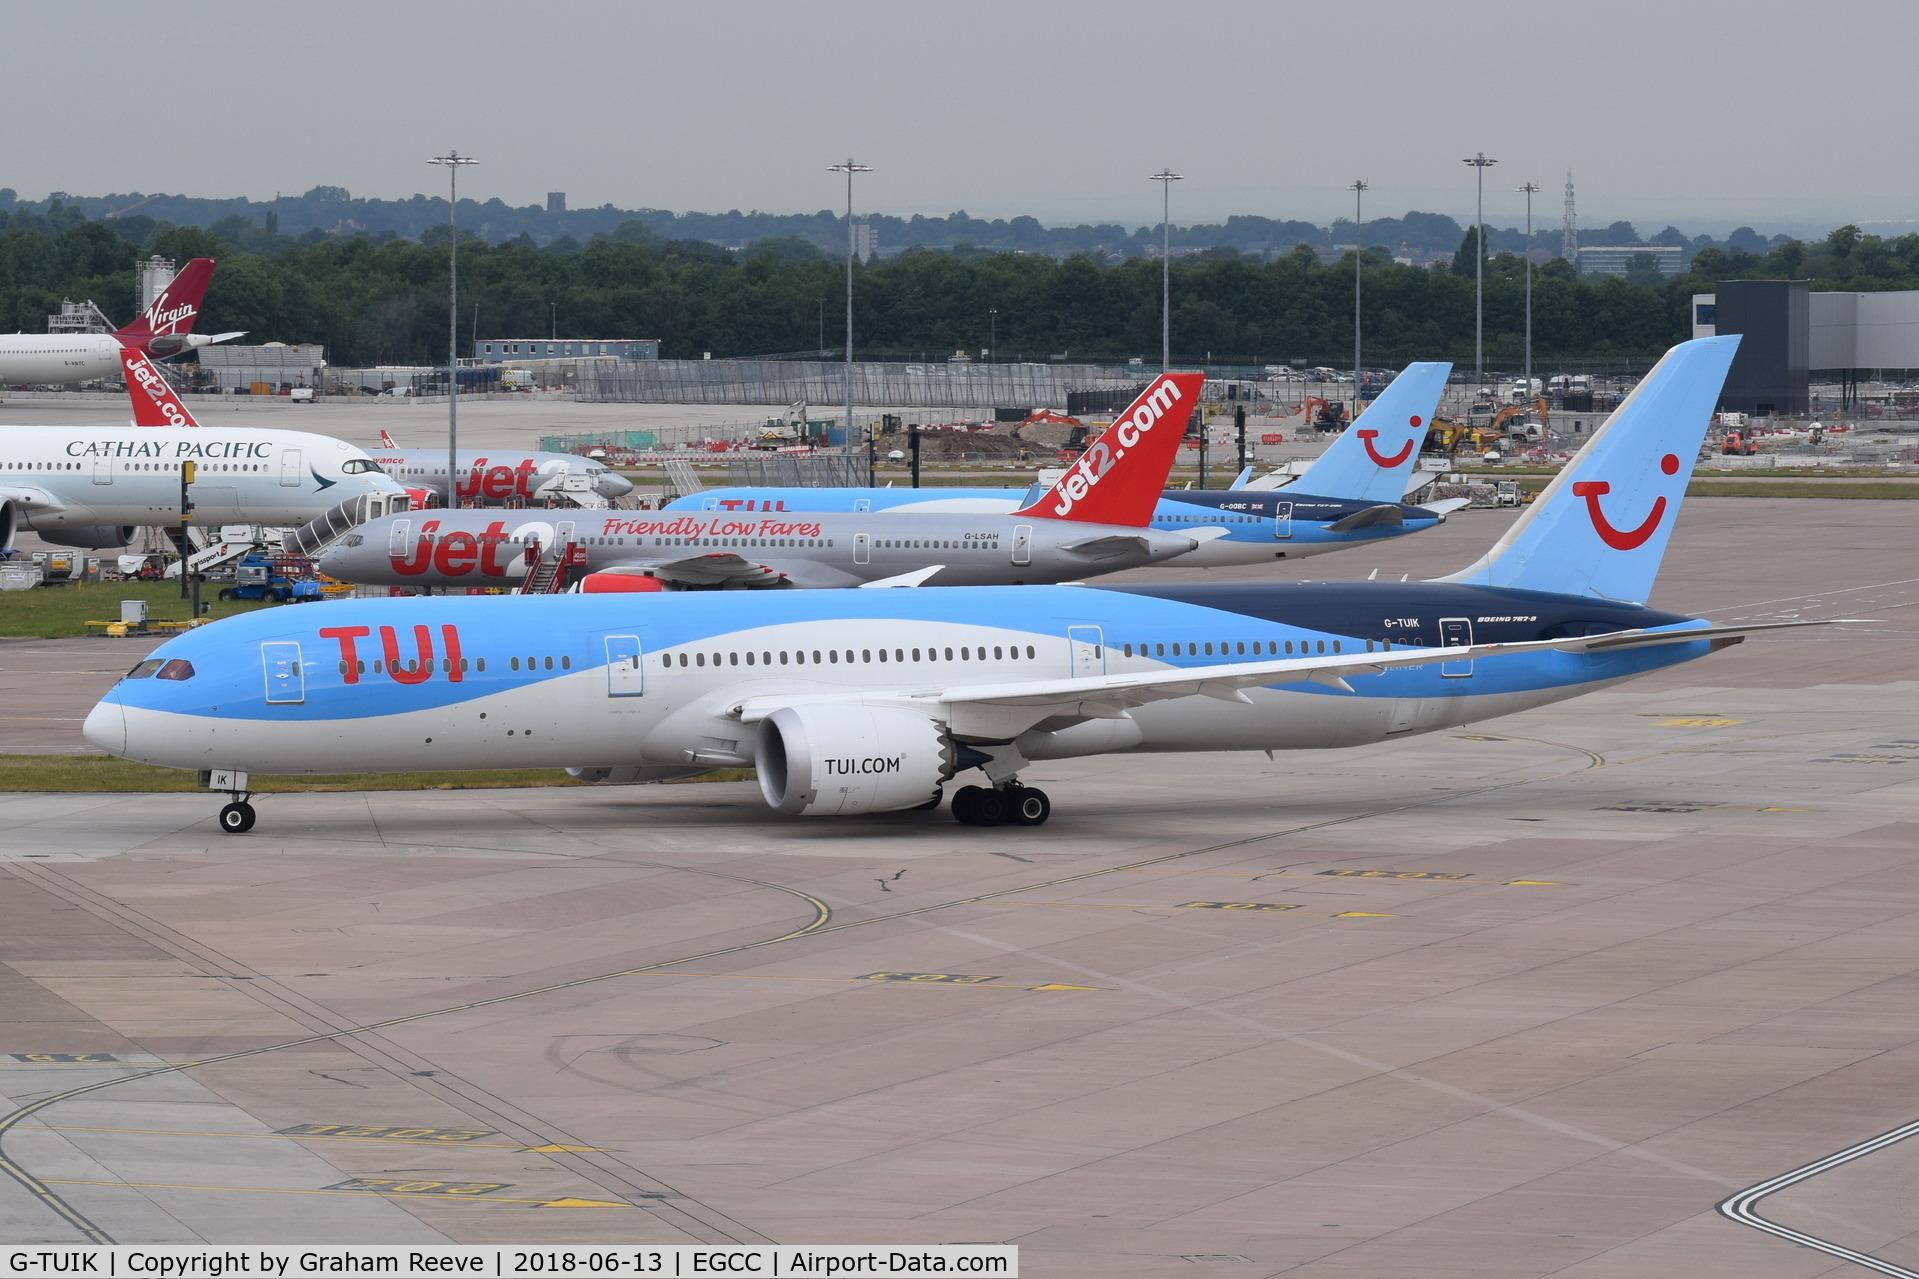 G-TUIK, 2017 Boeing 787-9 Dreamliner C/N 44579, Departing from Manchester.